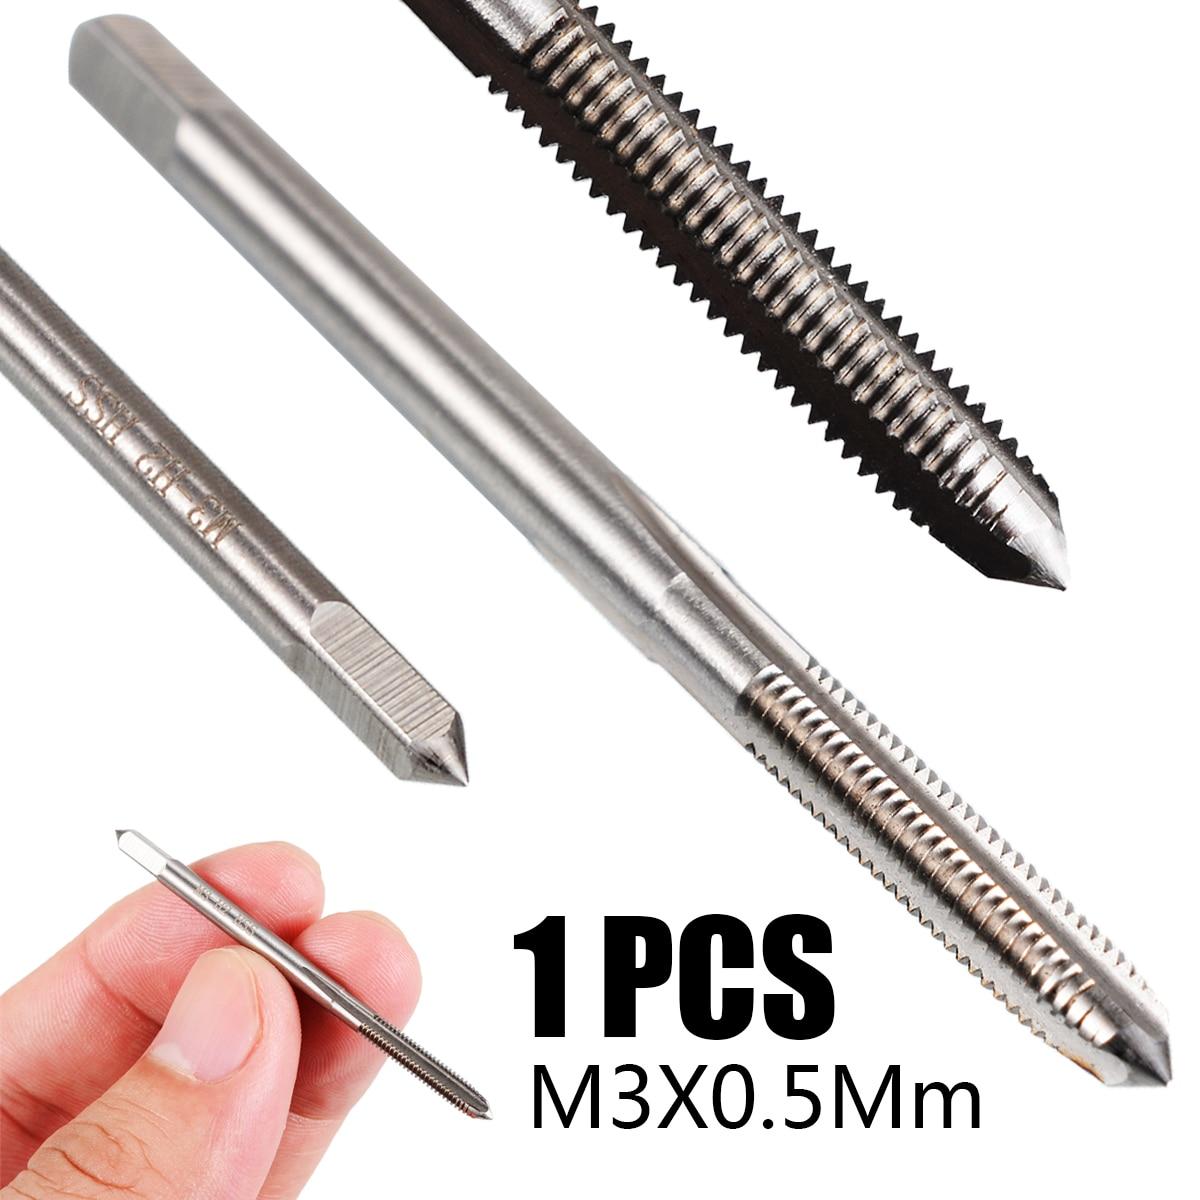 1PCS HSS M5 × 0.5 mm right Hand Thread  tap Threading Tool Metric M5*0.5